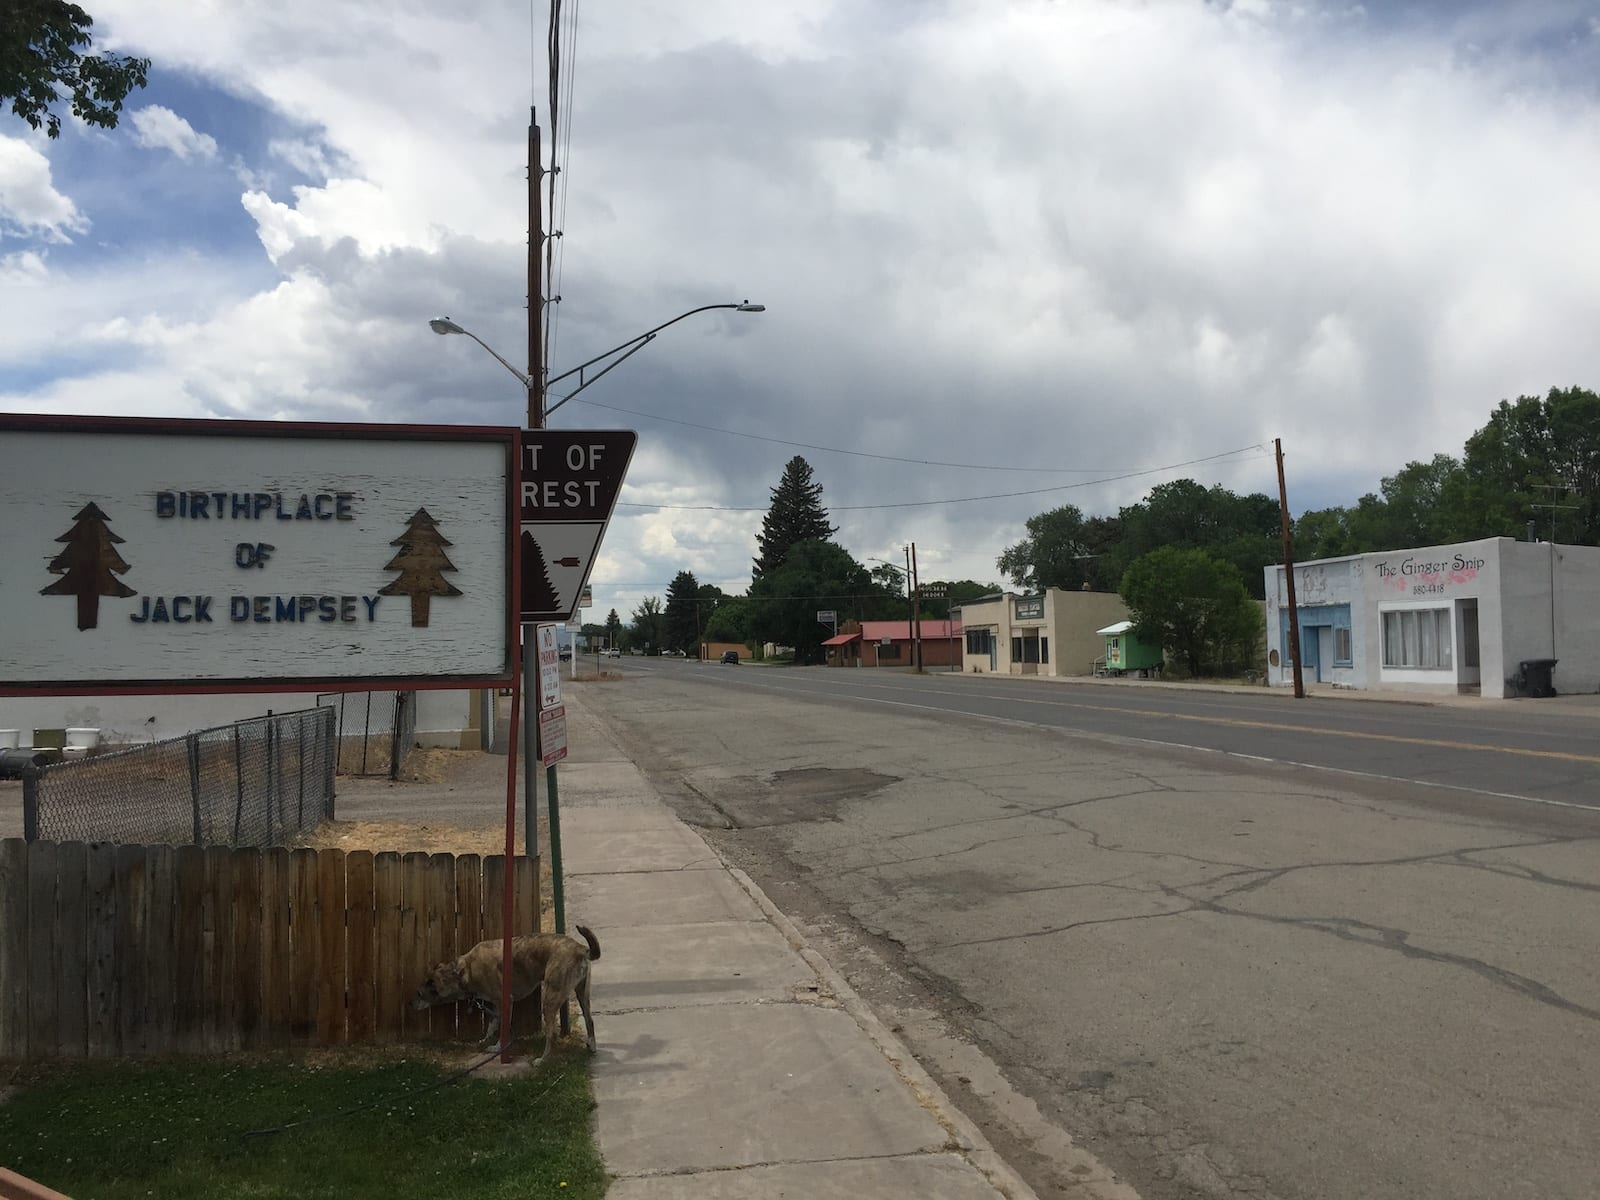 Manassa Colorado Birthplace of Jack Dempsey Sign